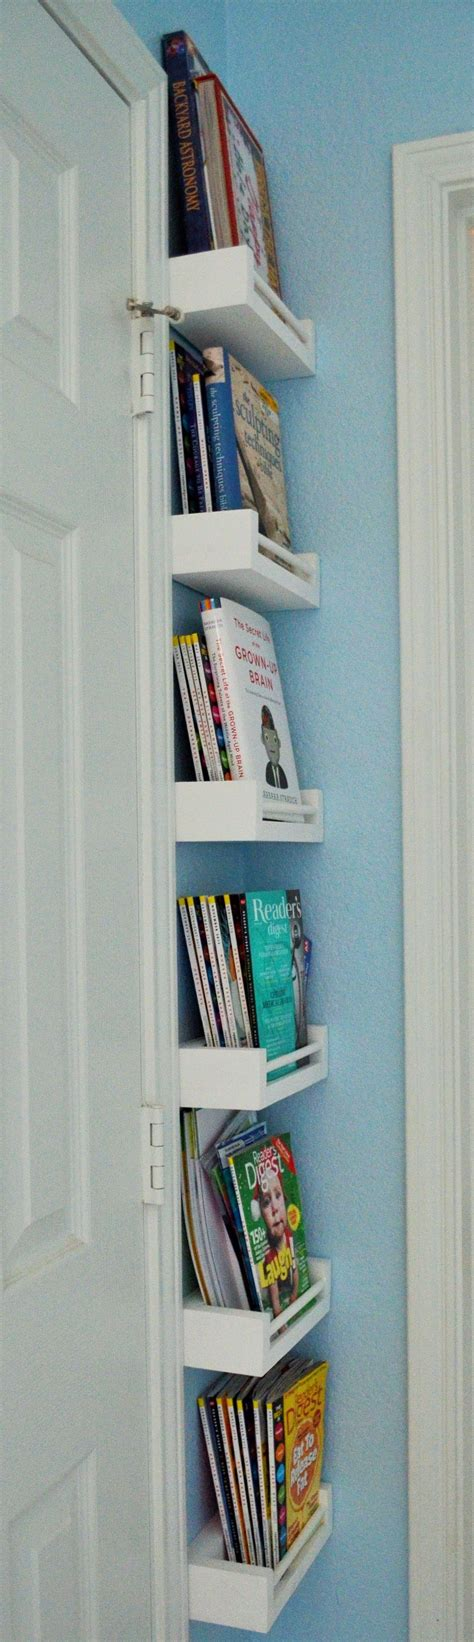 small corner bookshelves bookcase